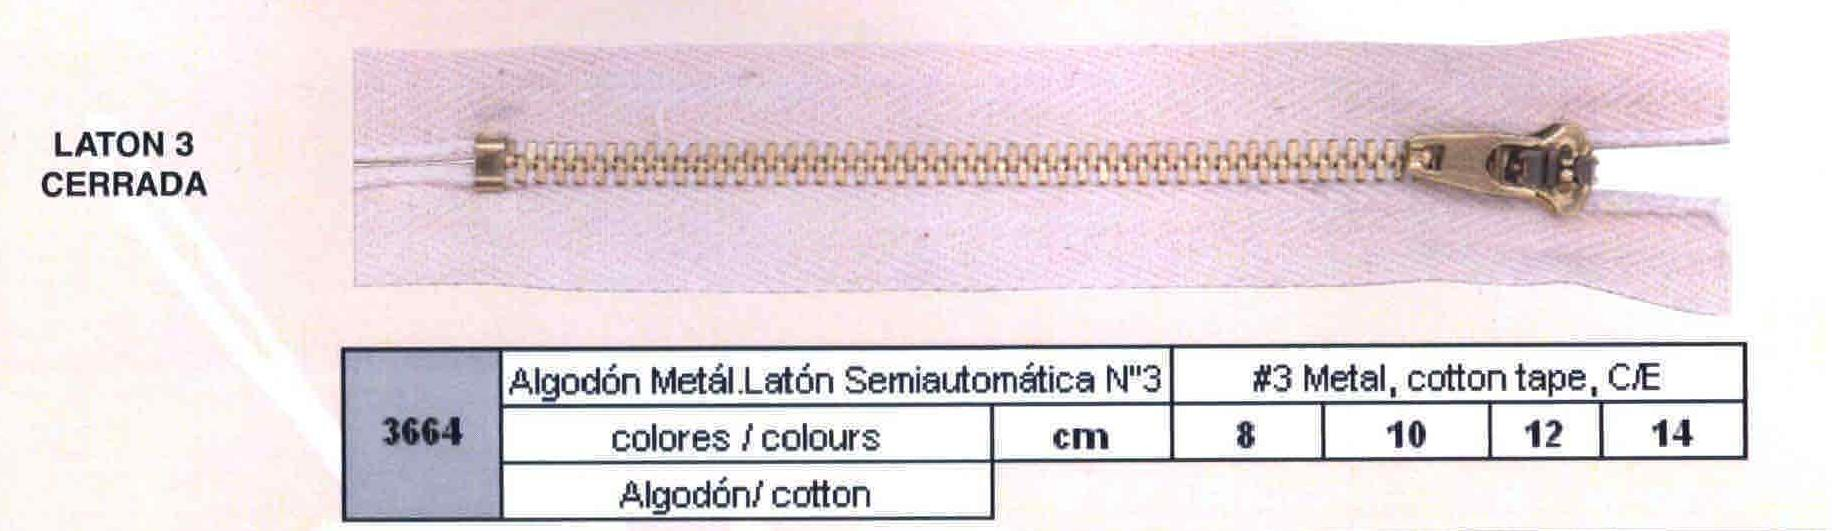 Cremallera SNS Algodón Metálica Latón Semiautomática num. 3